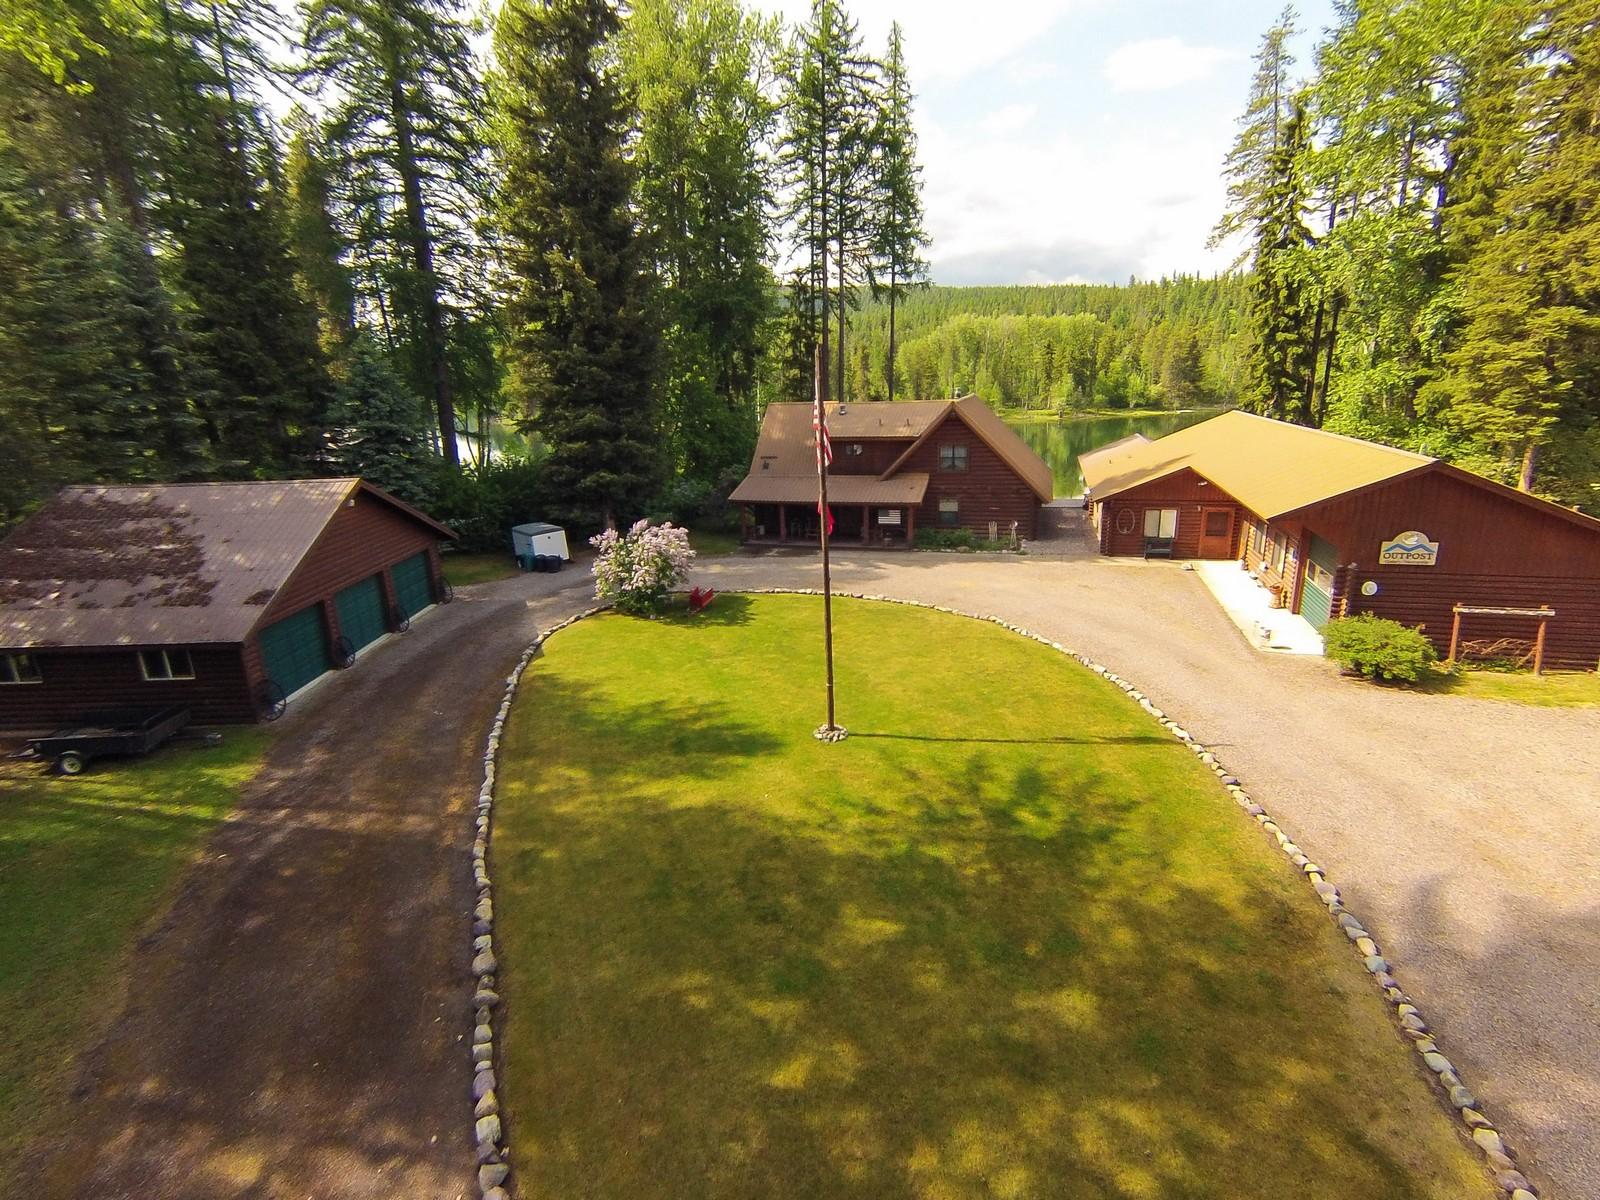 独户住宅 为 销售 在 1097 Mt Highway 209 , Bigfork, MT 59911 1097 Mt Highway 209 比格福克, 蒙大拿州, 59911 美国